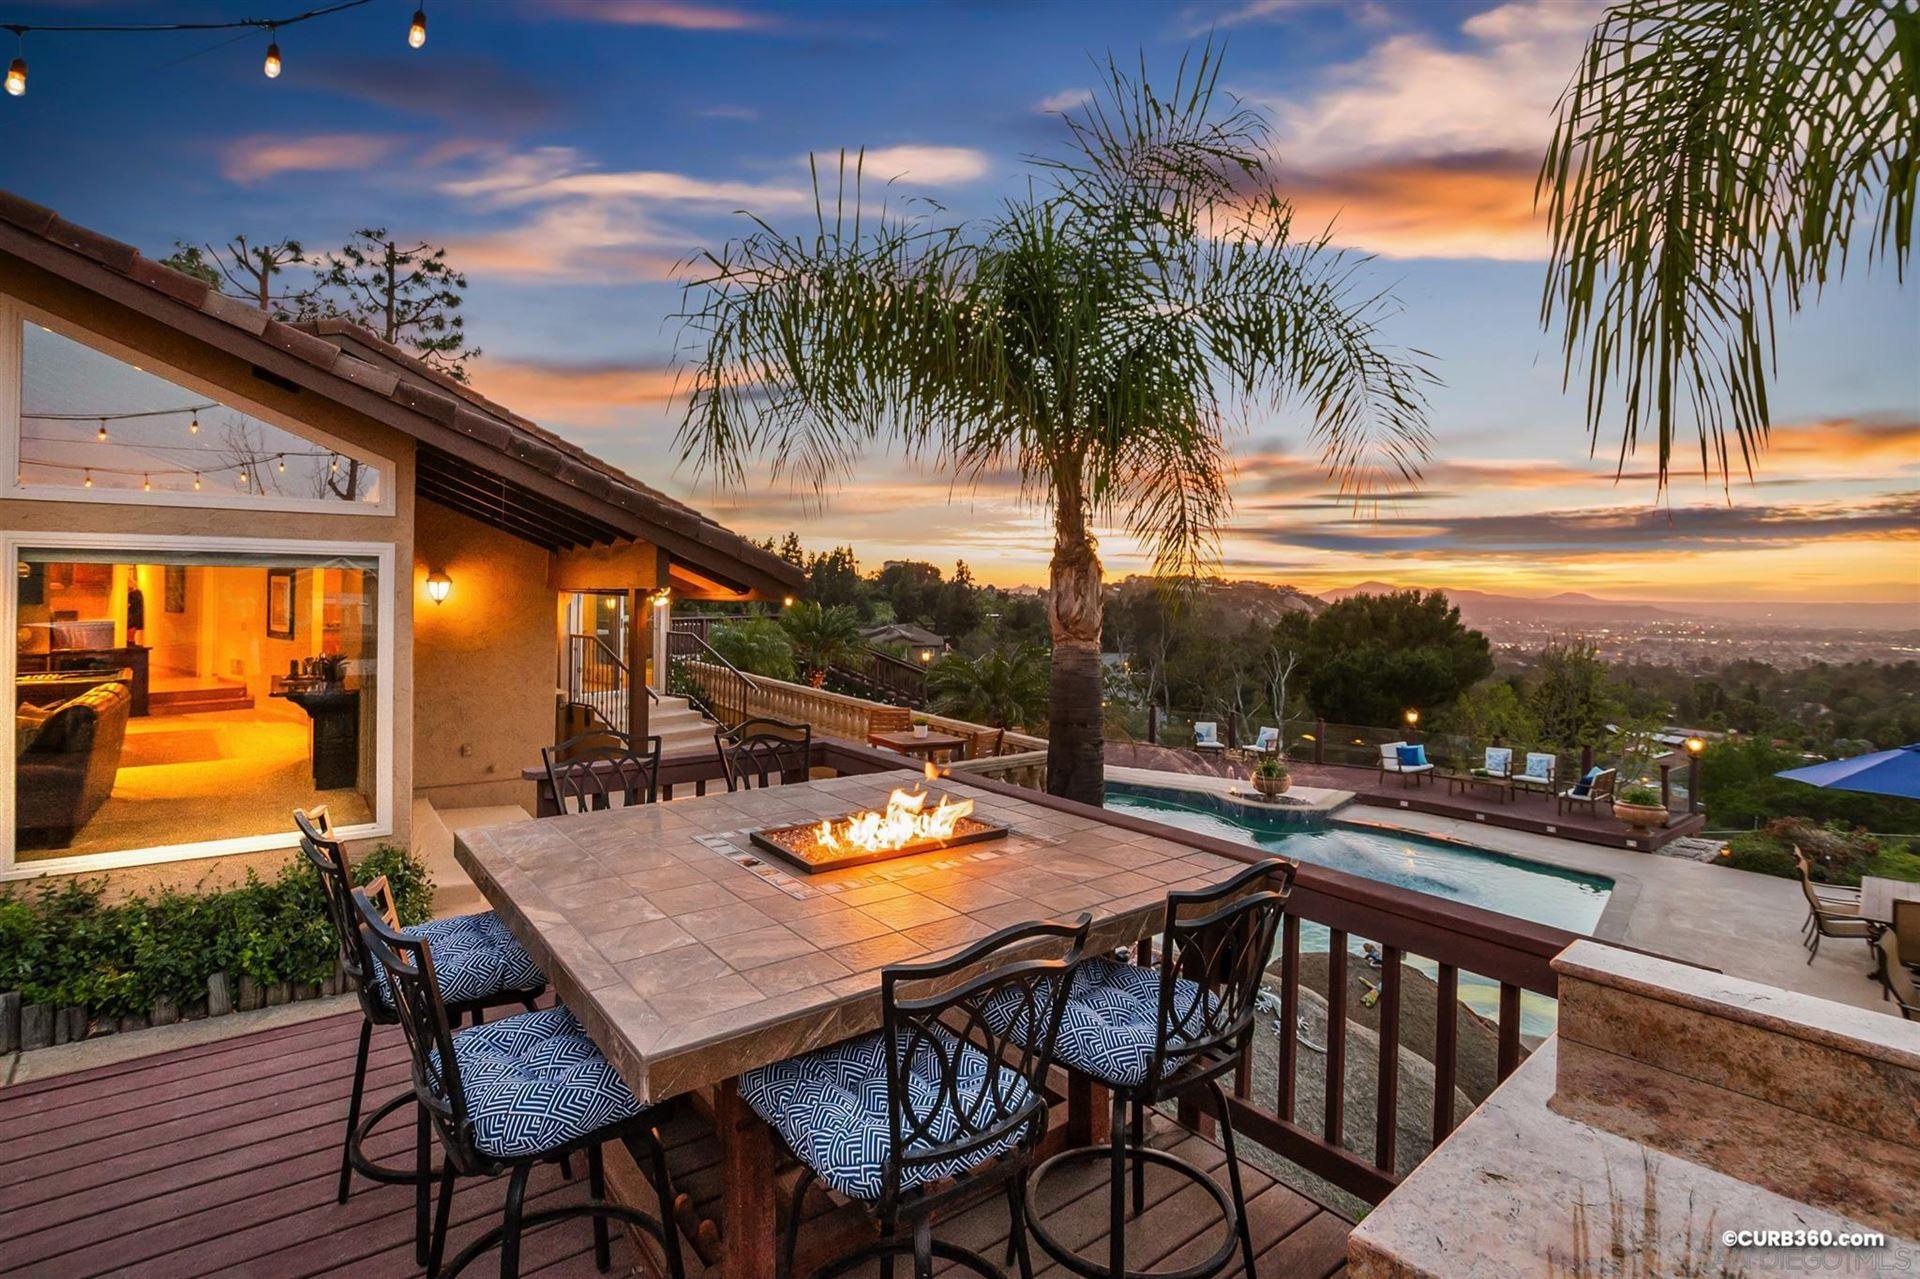 Photo of 1155 Vista Sierra Dr, El Cajon, CA 92019 (MLS # 210009159)